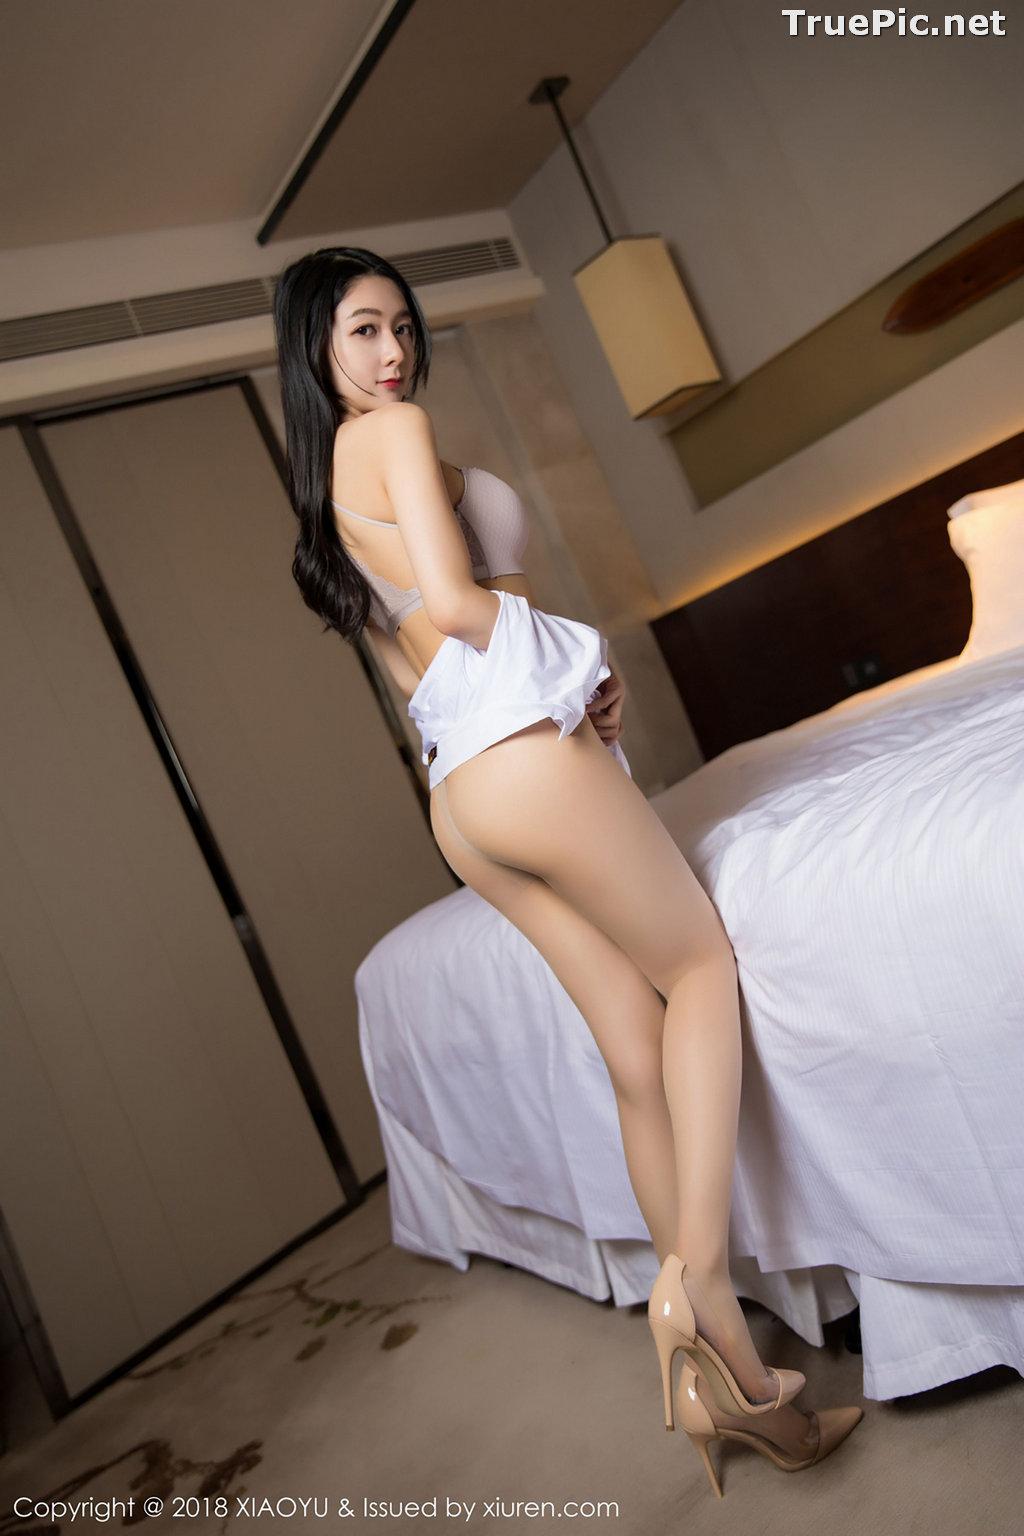 Image XiaoYu No.004 - Chinese Model - Xiao Reba (Angela喜欢猫) - White Sexy Nurse - TruePic.net - Picture-33